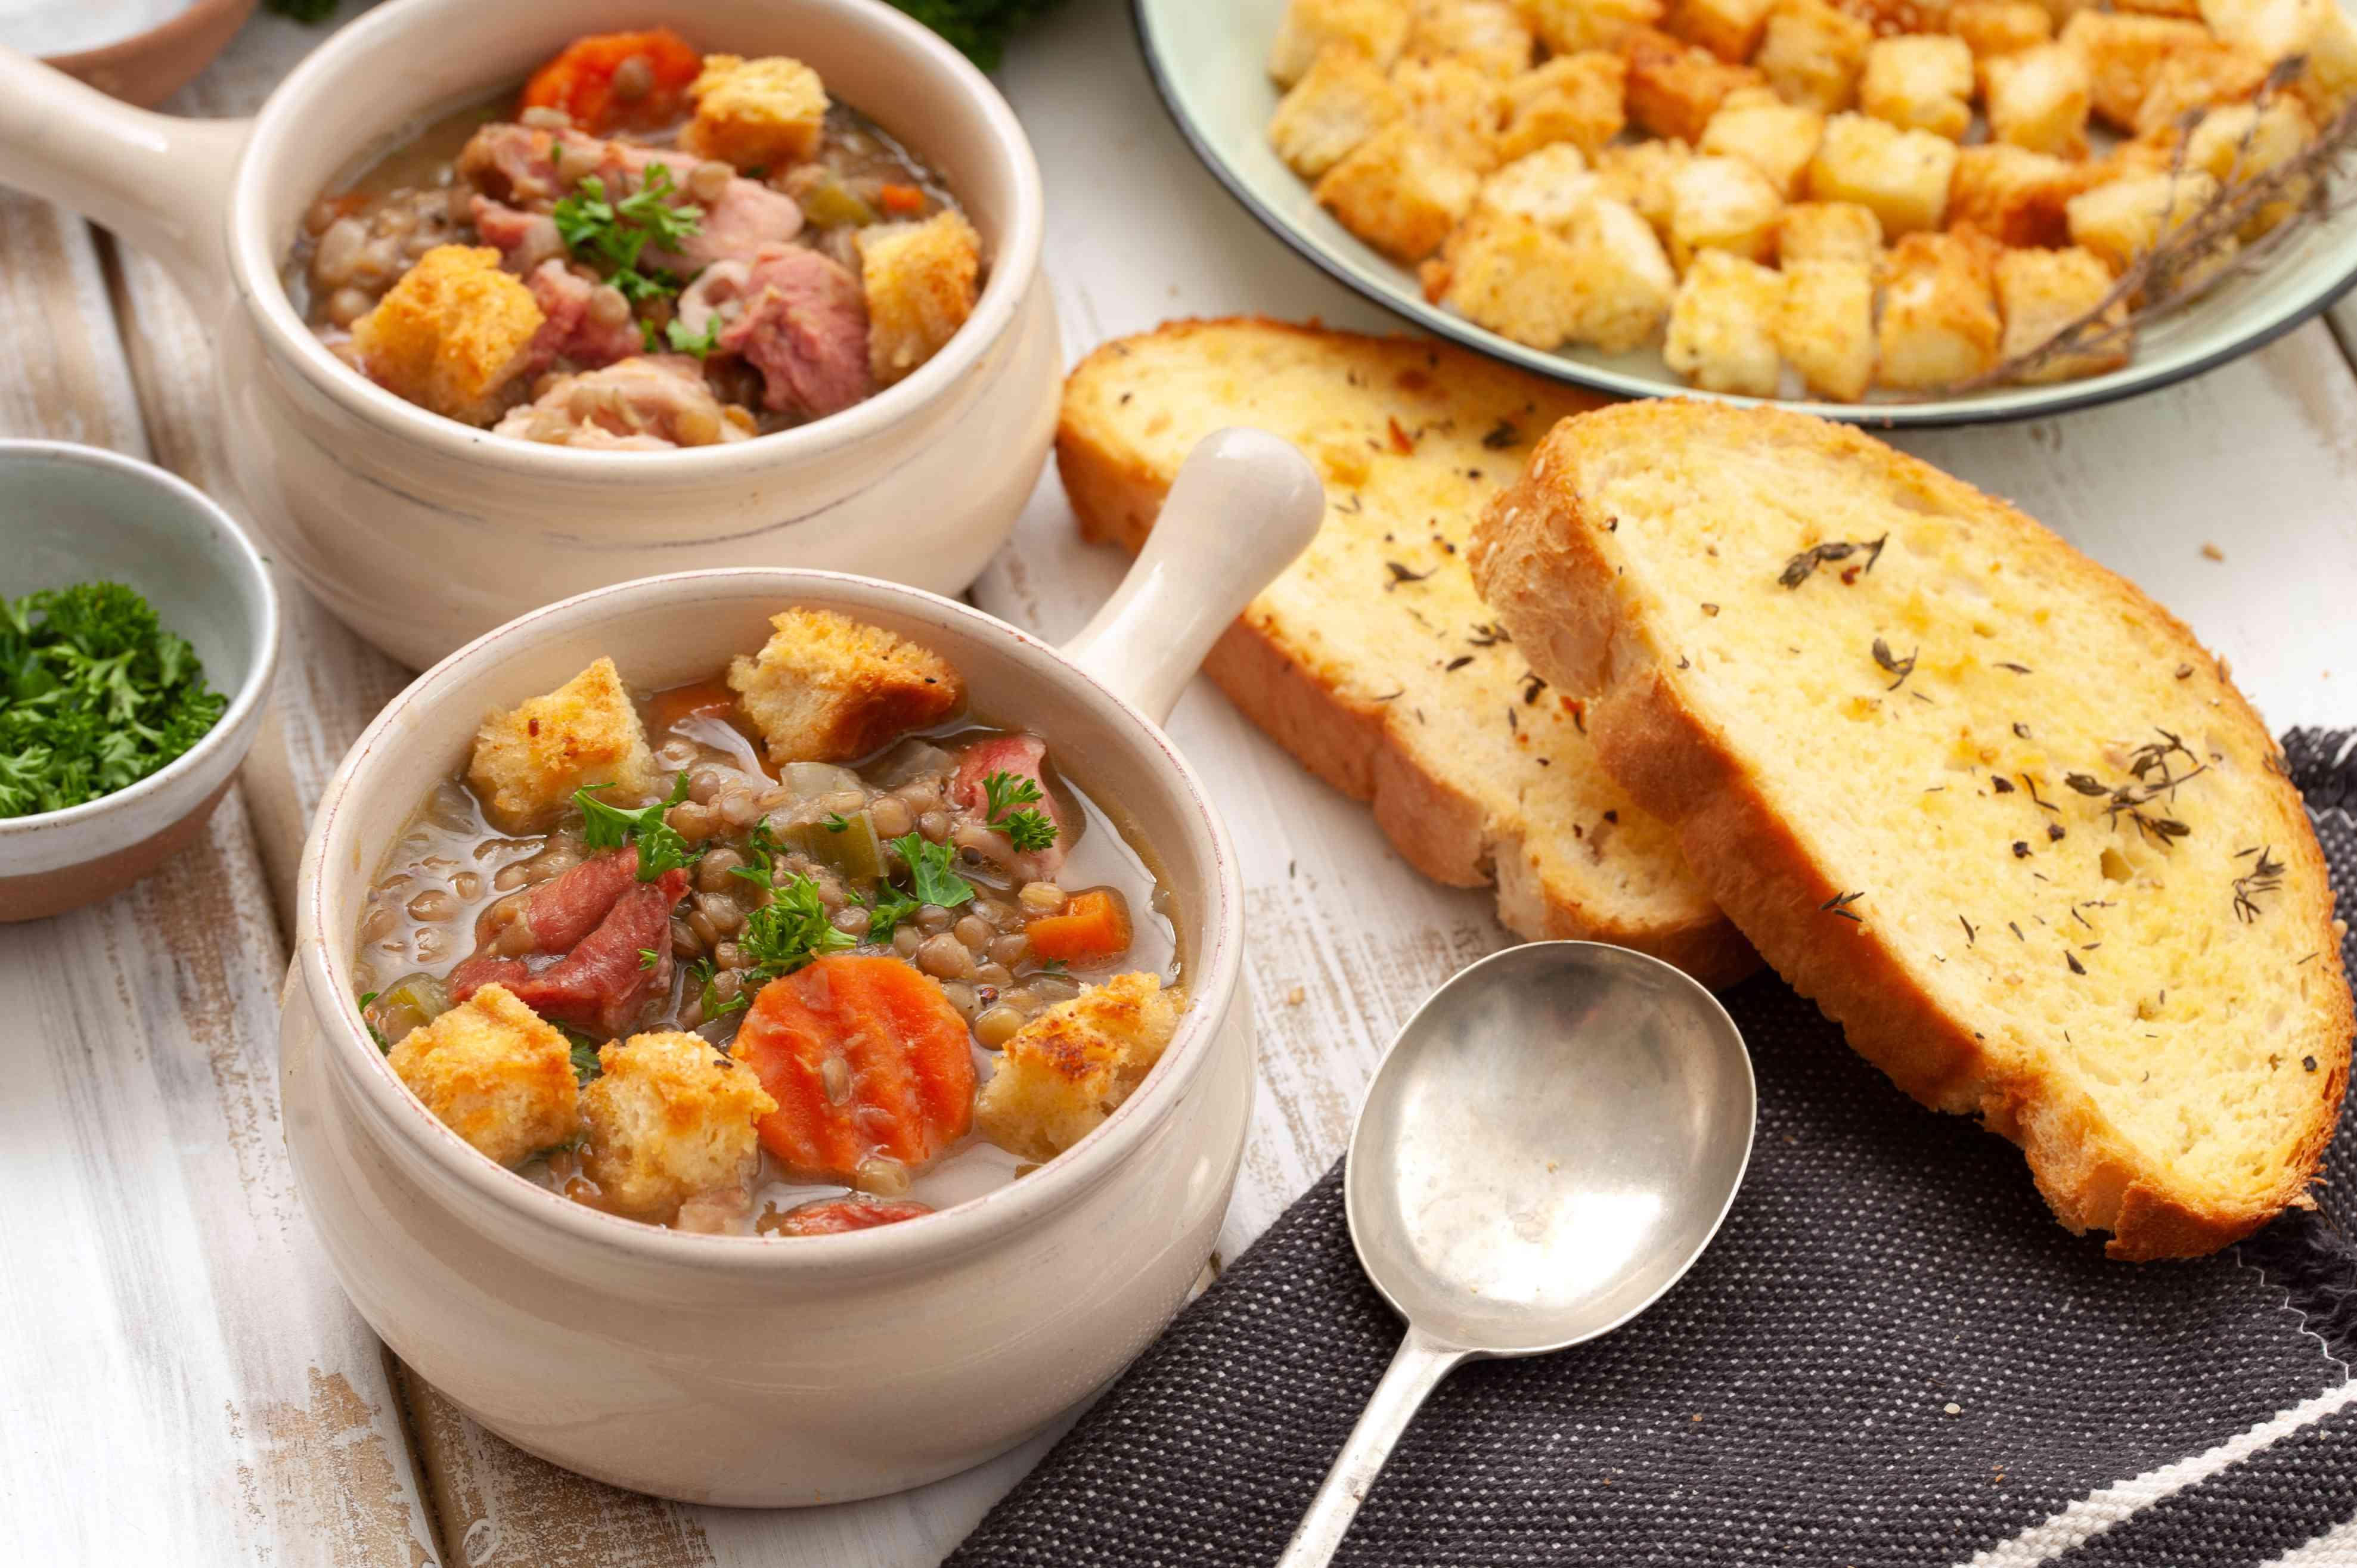 Bowls of lentil soup with parsley garnish